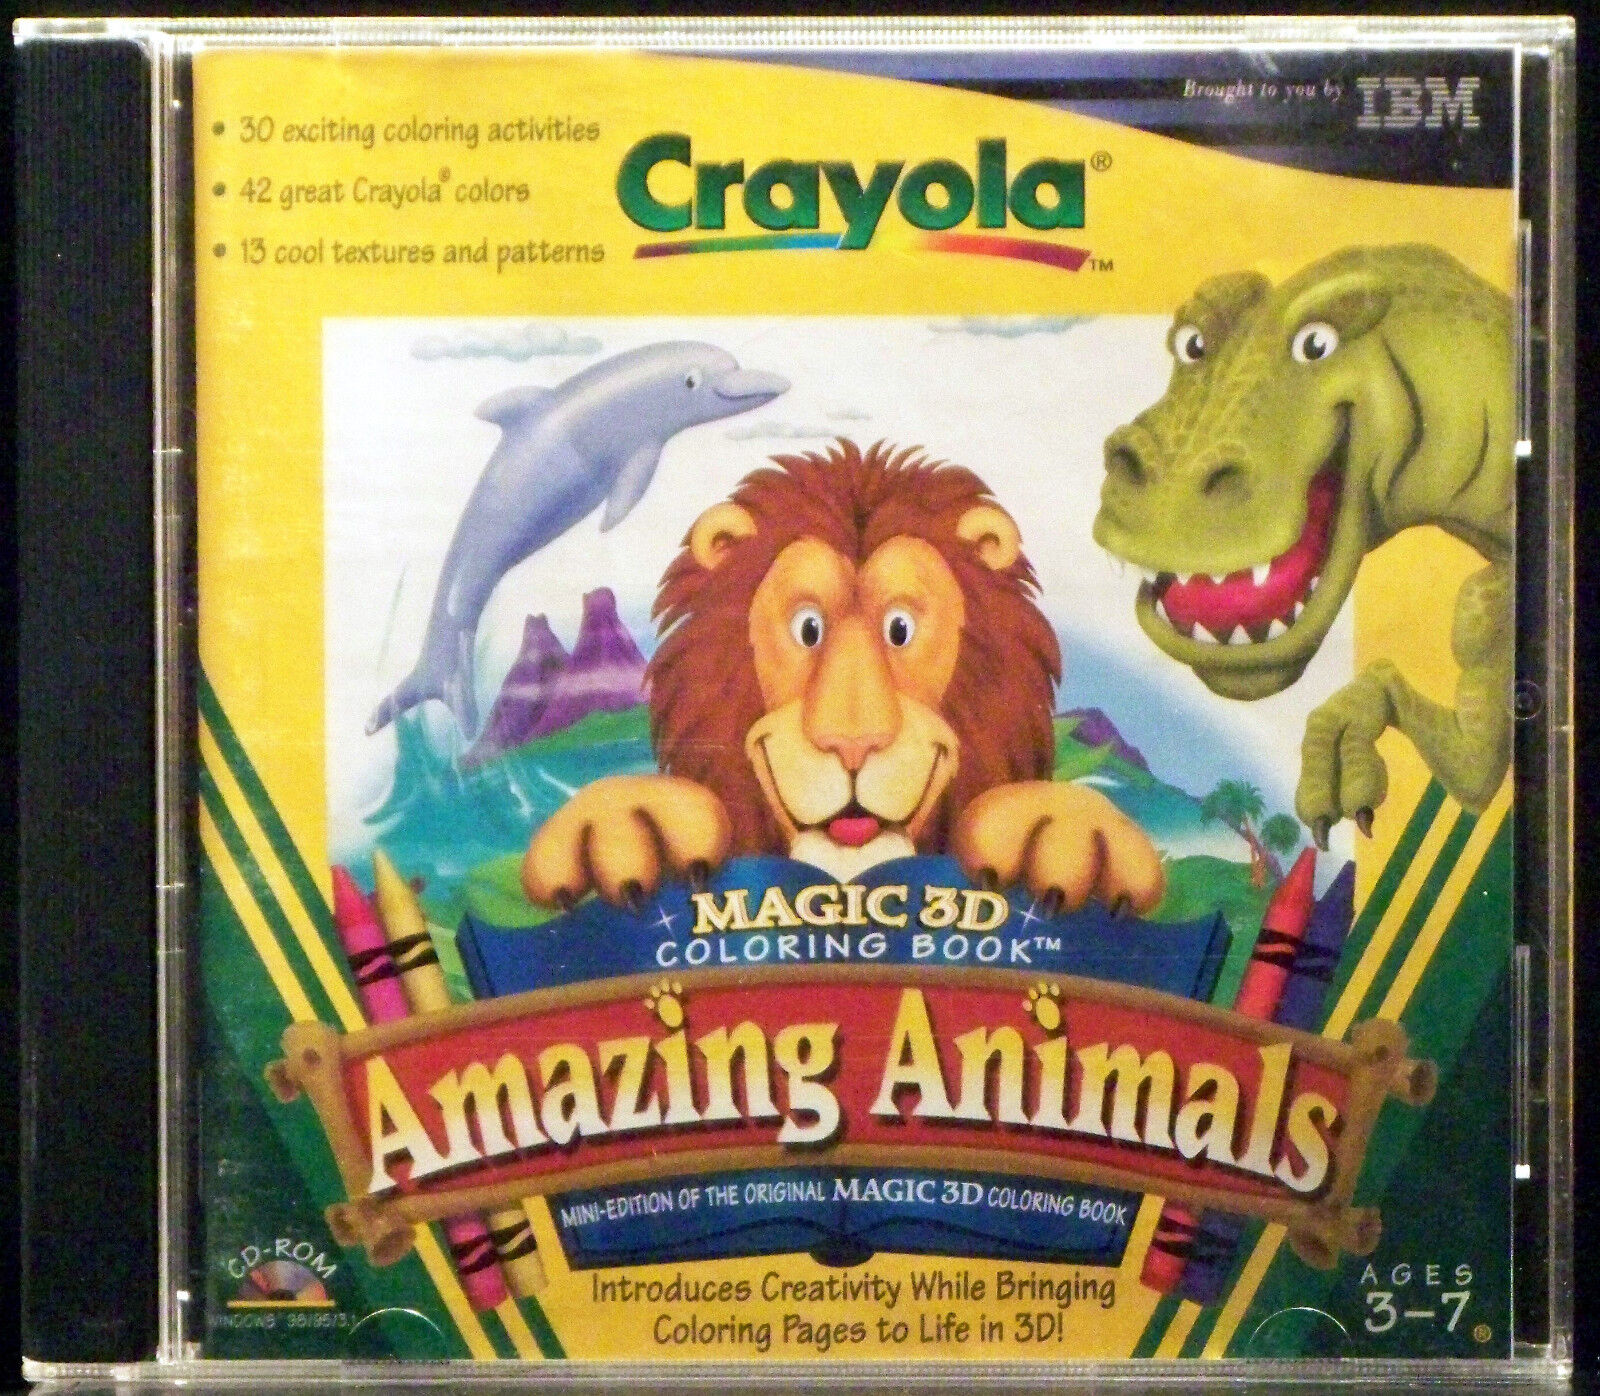 Crayola Magic 3D Coloring Book: Amazing Animals (PC, 1998)   eBay